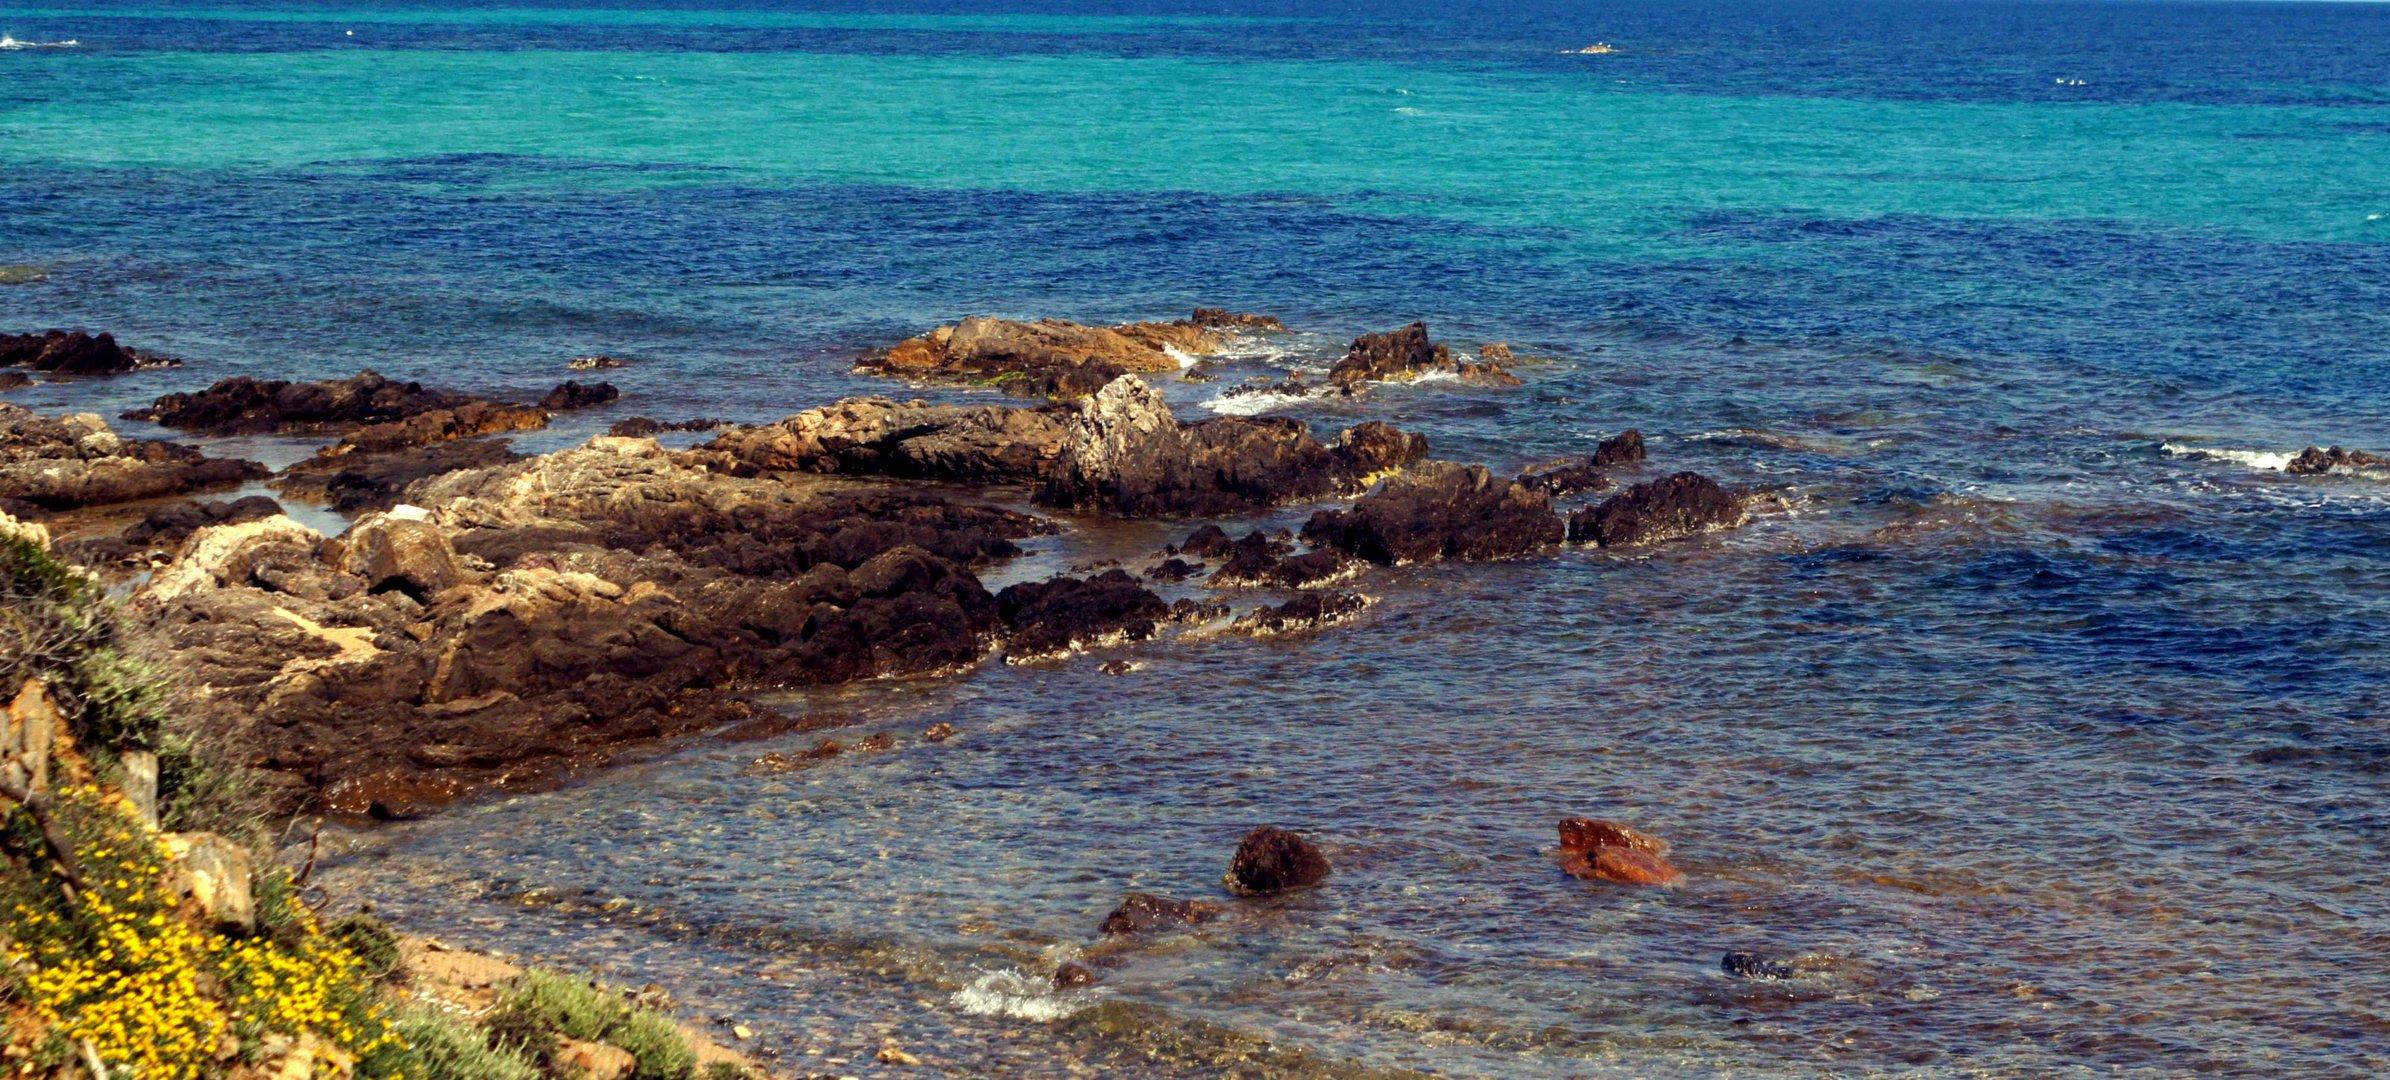 einsamer Meeresstrand